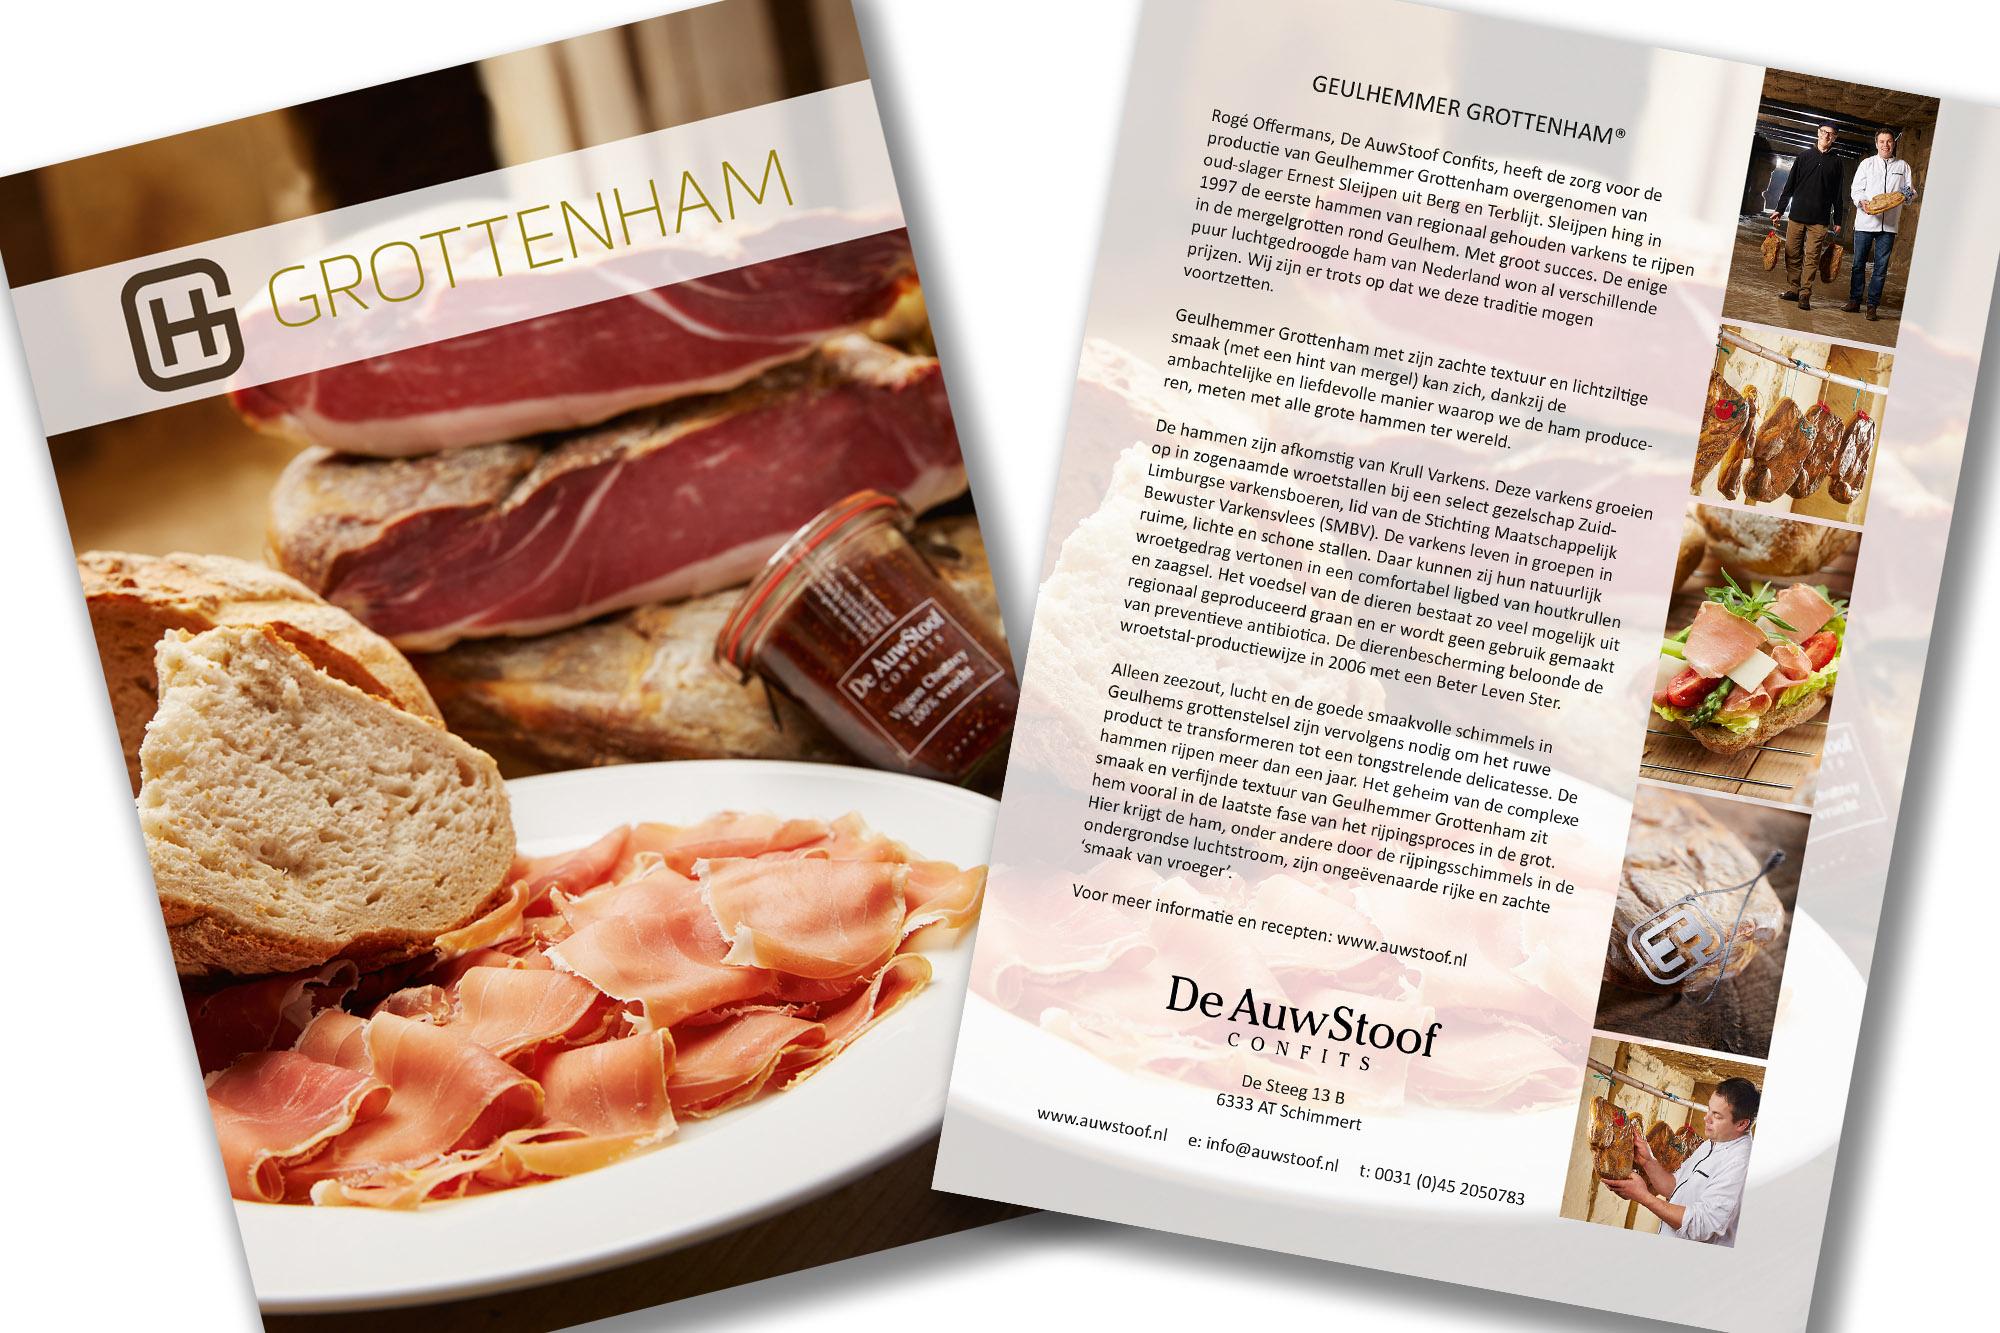 SPUISERS Auwstoof grottenham mergelgrotten Geulhemmer culinair ham drukwerk grafische vormgeving dtp flyer kaart